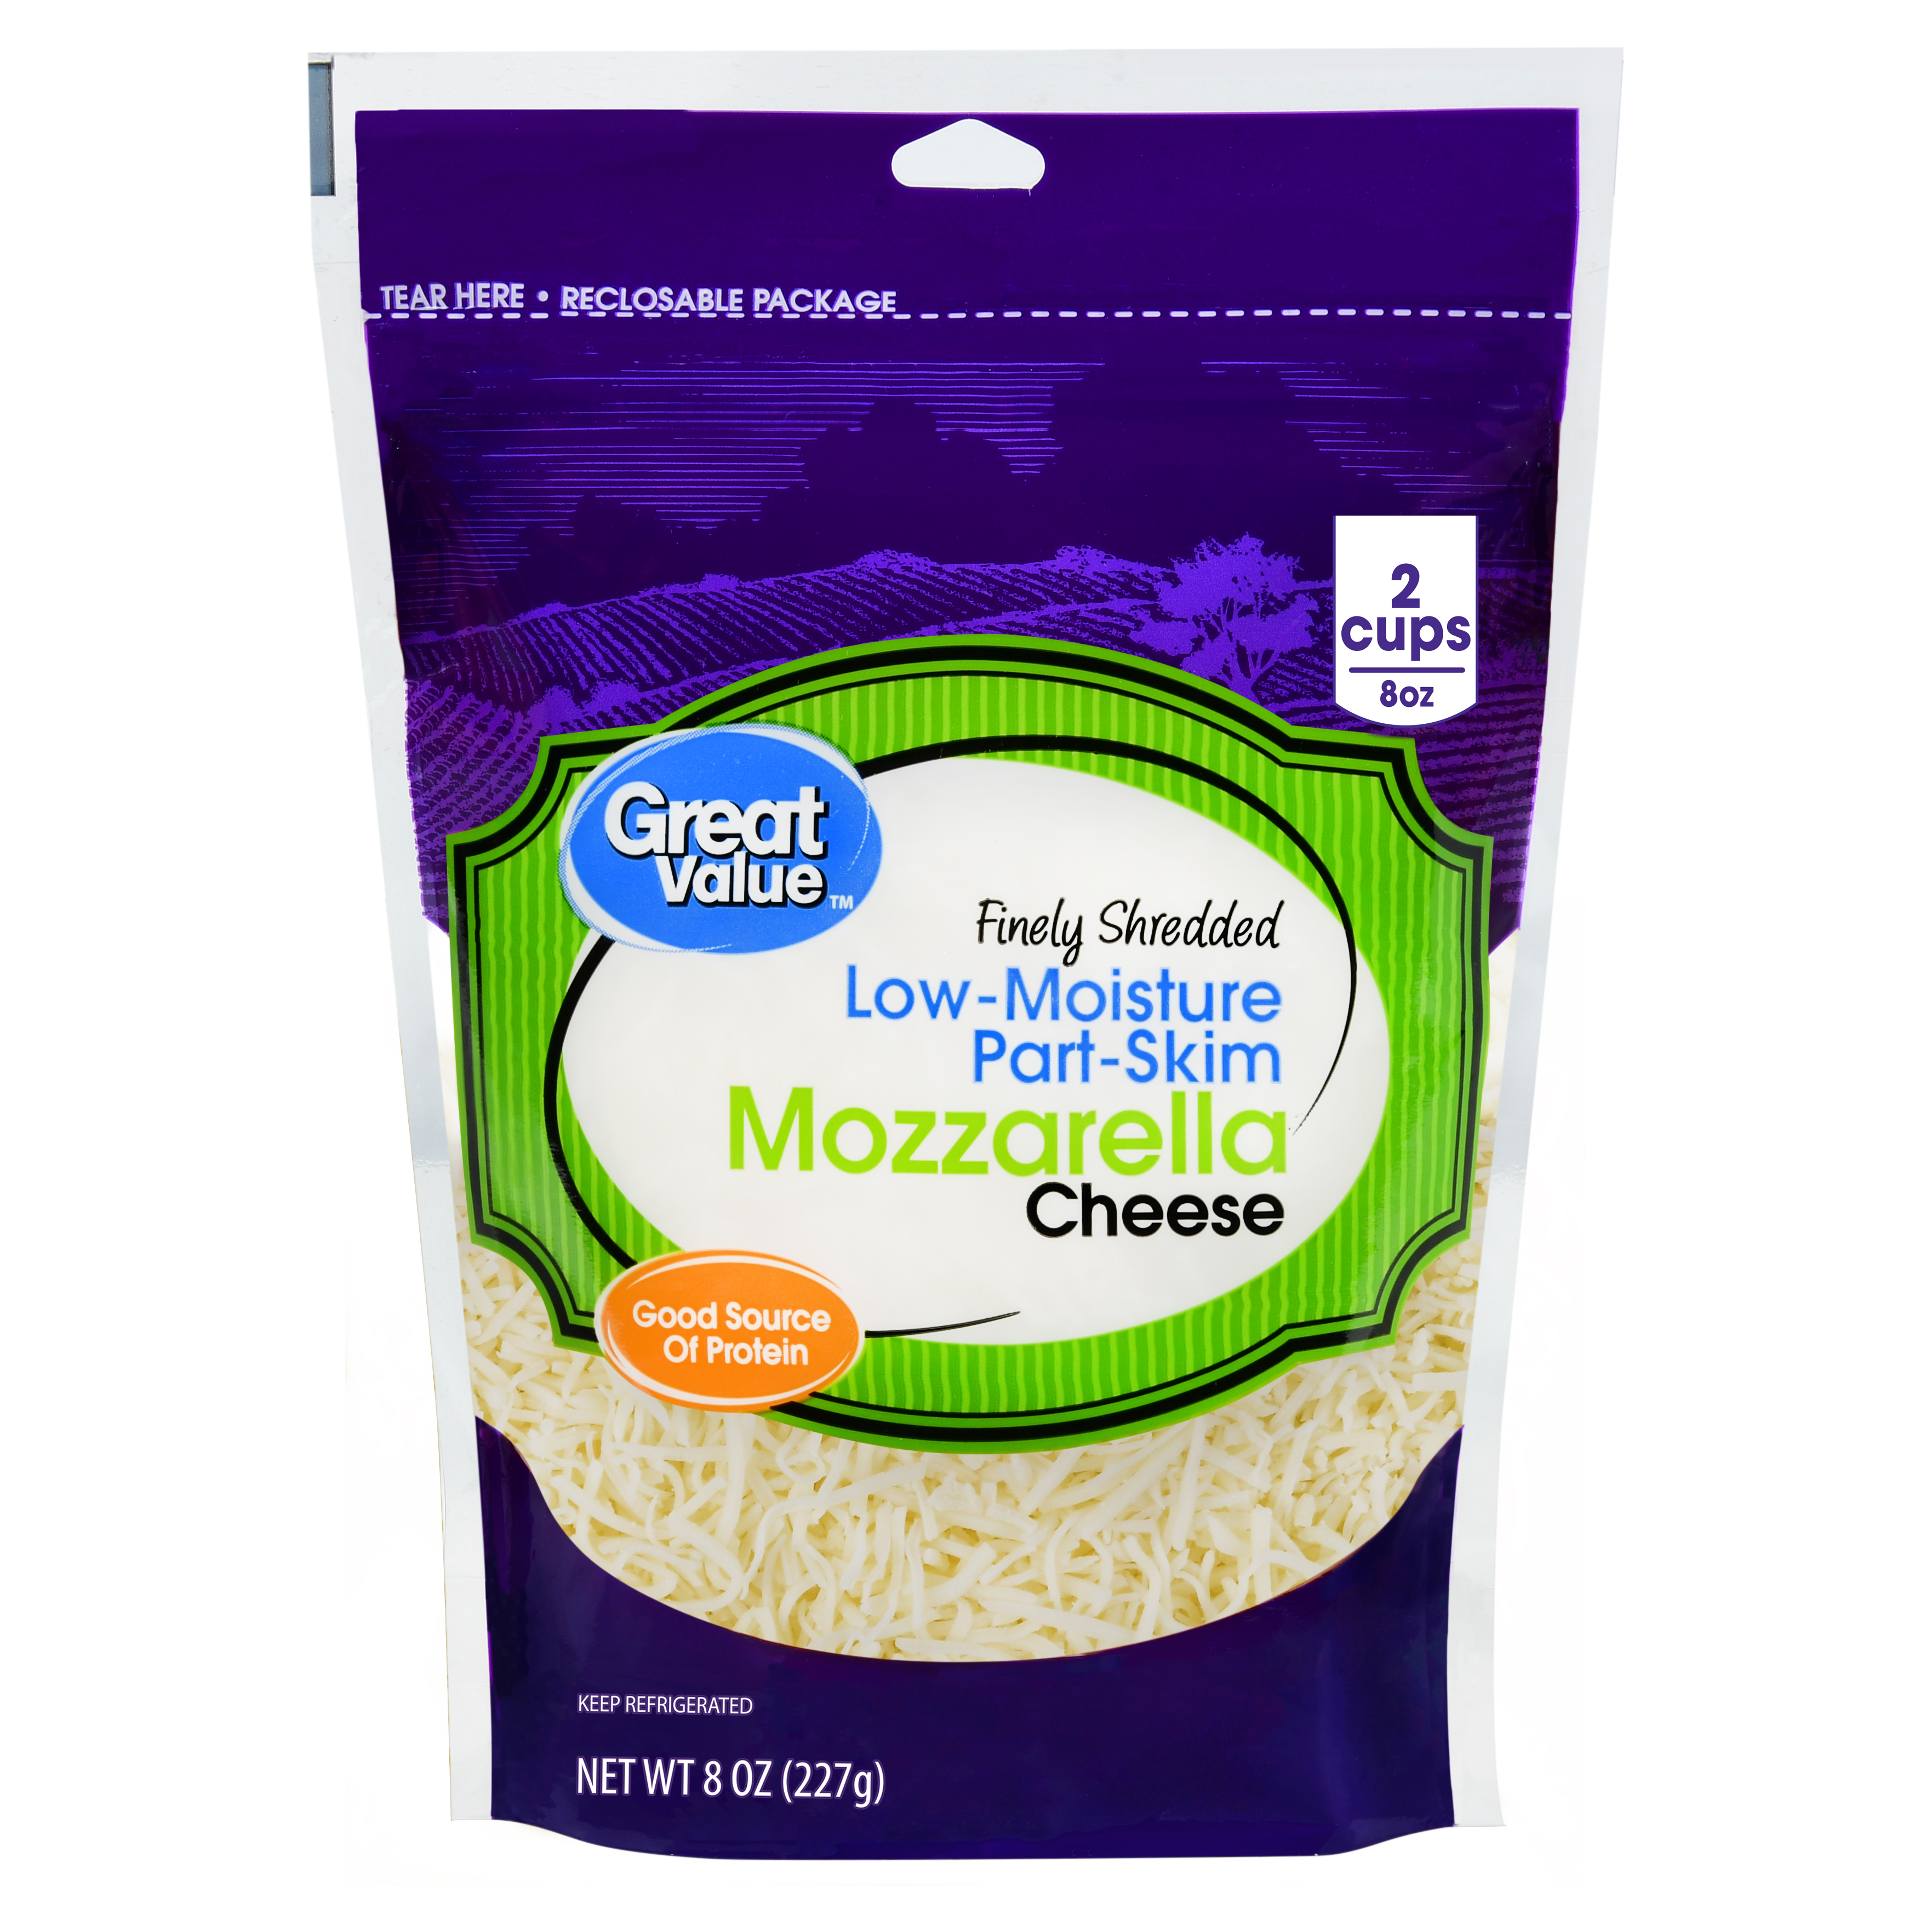 Great Value Finely Shredded Mozzarella Cheese, Low-Moisture Part-Skim, 8 oz